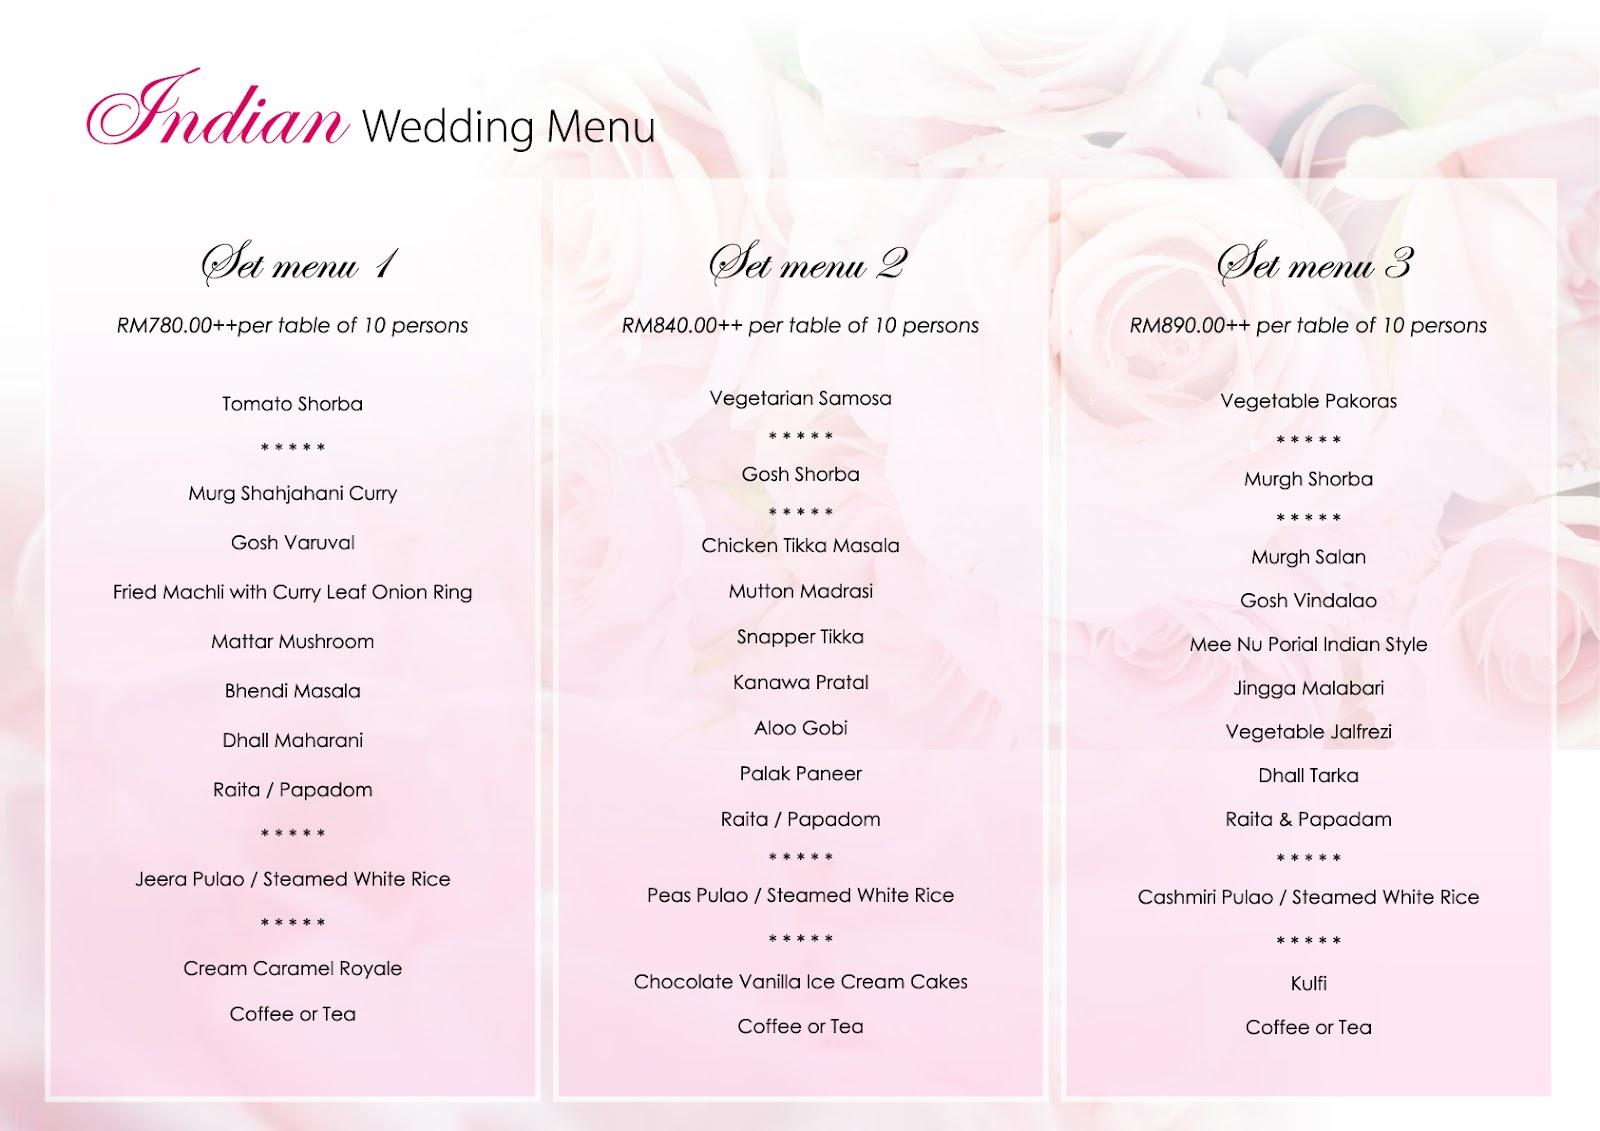 Wedding Food Menu Bing Images